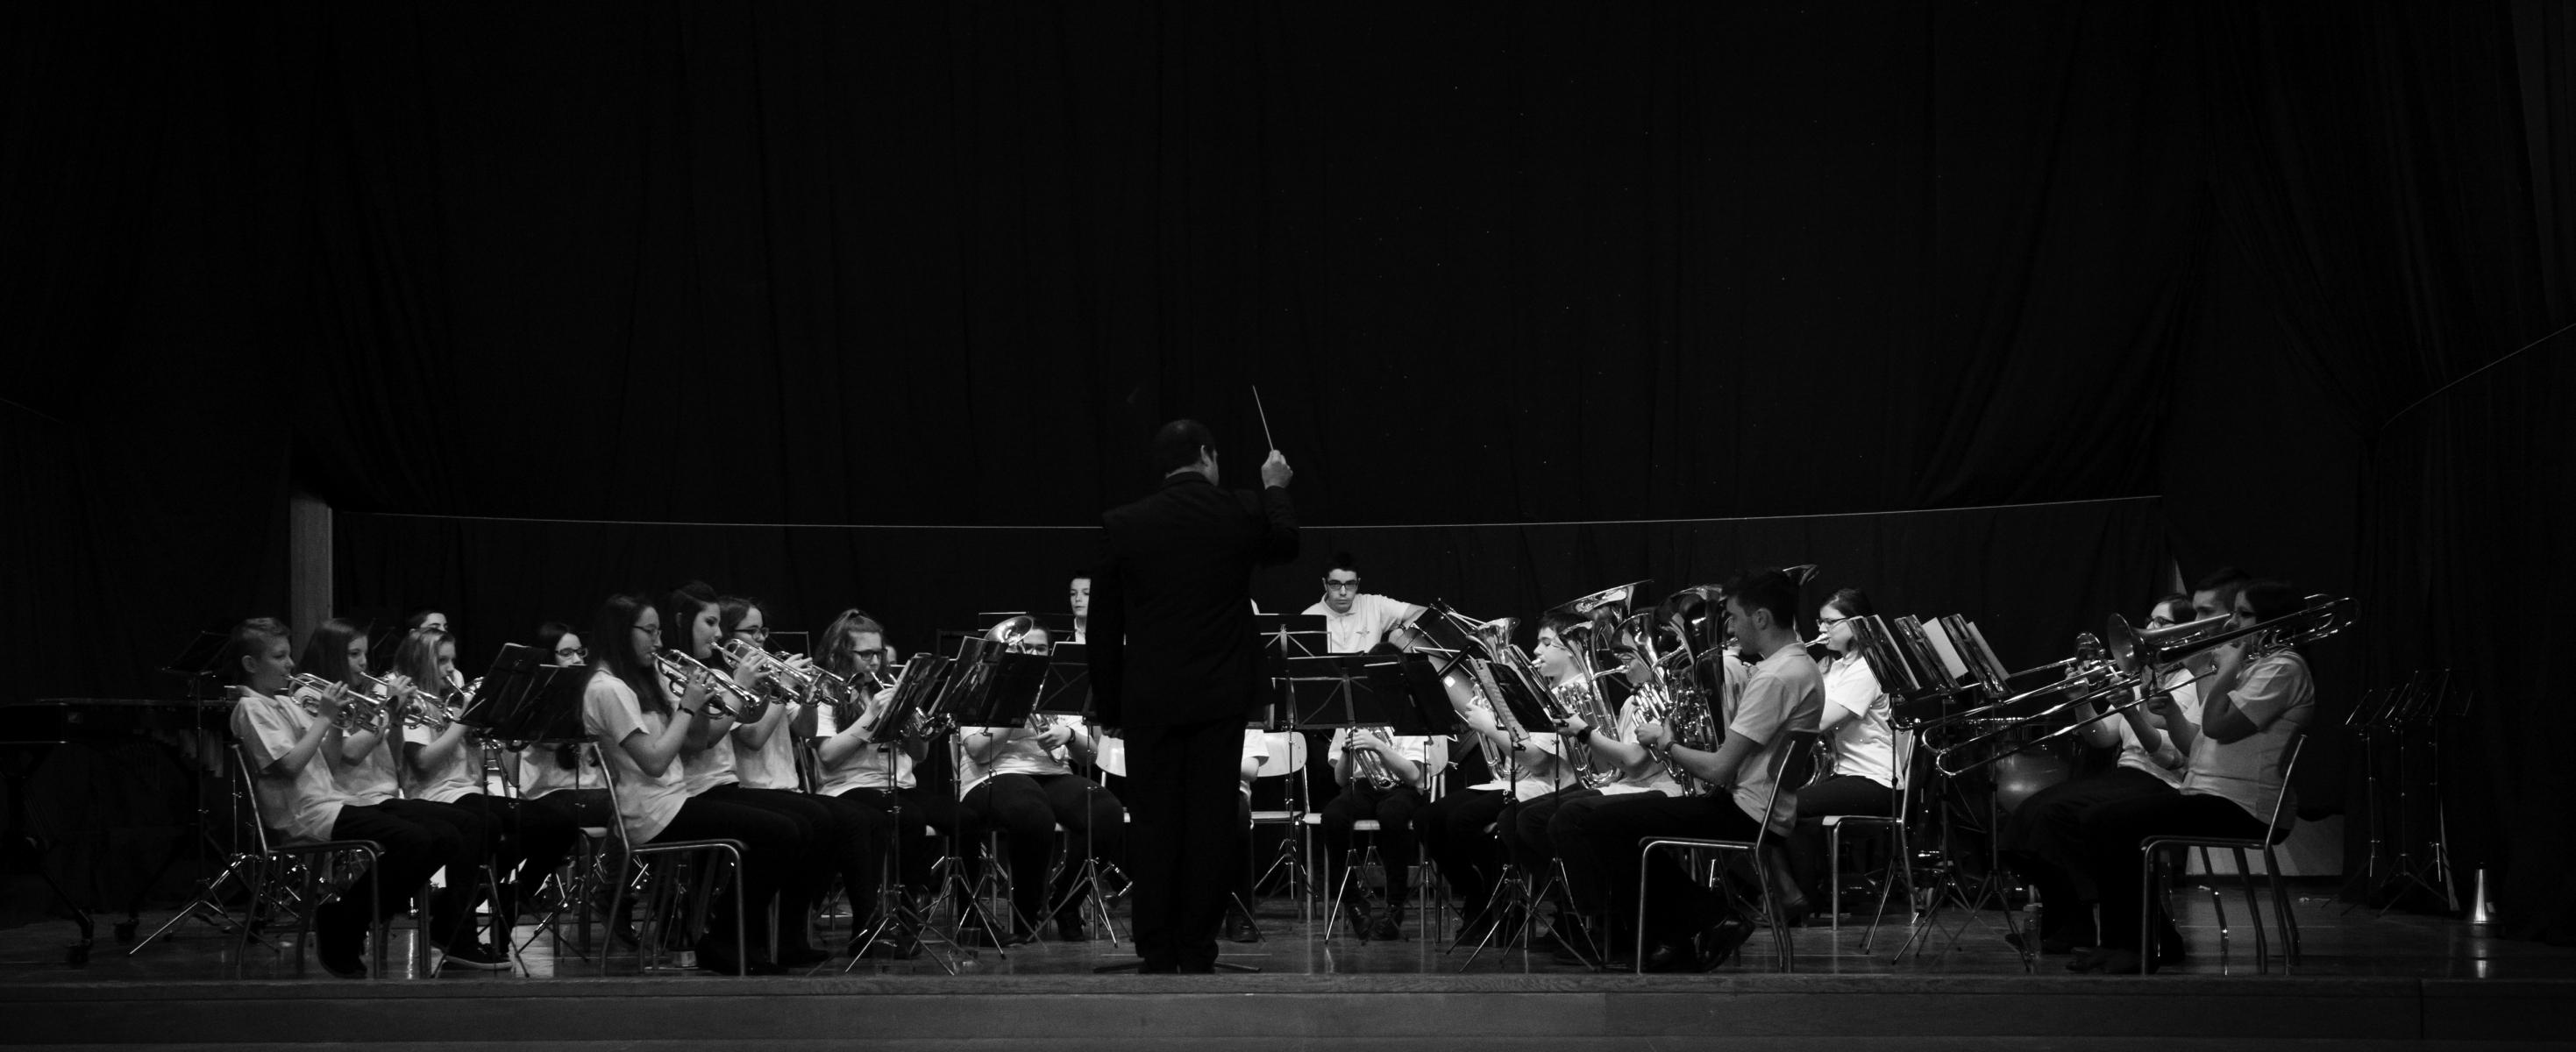 170211_concert_annuel17-010